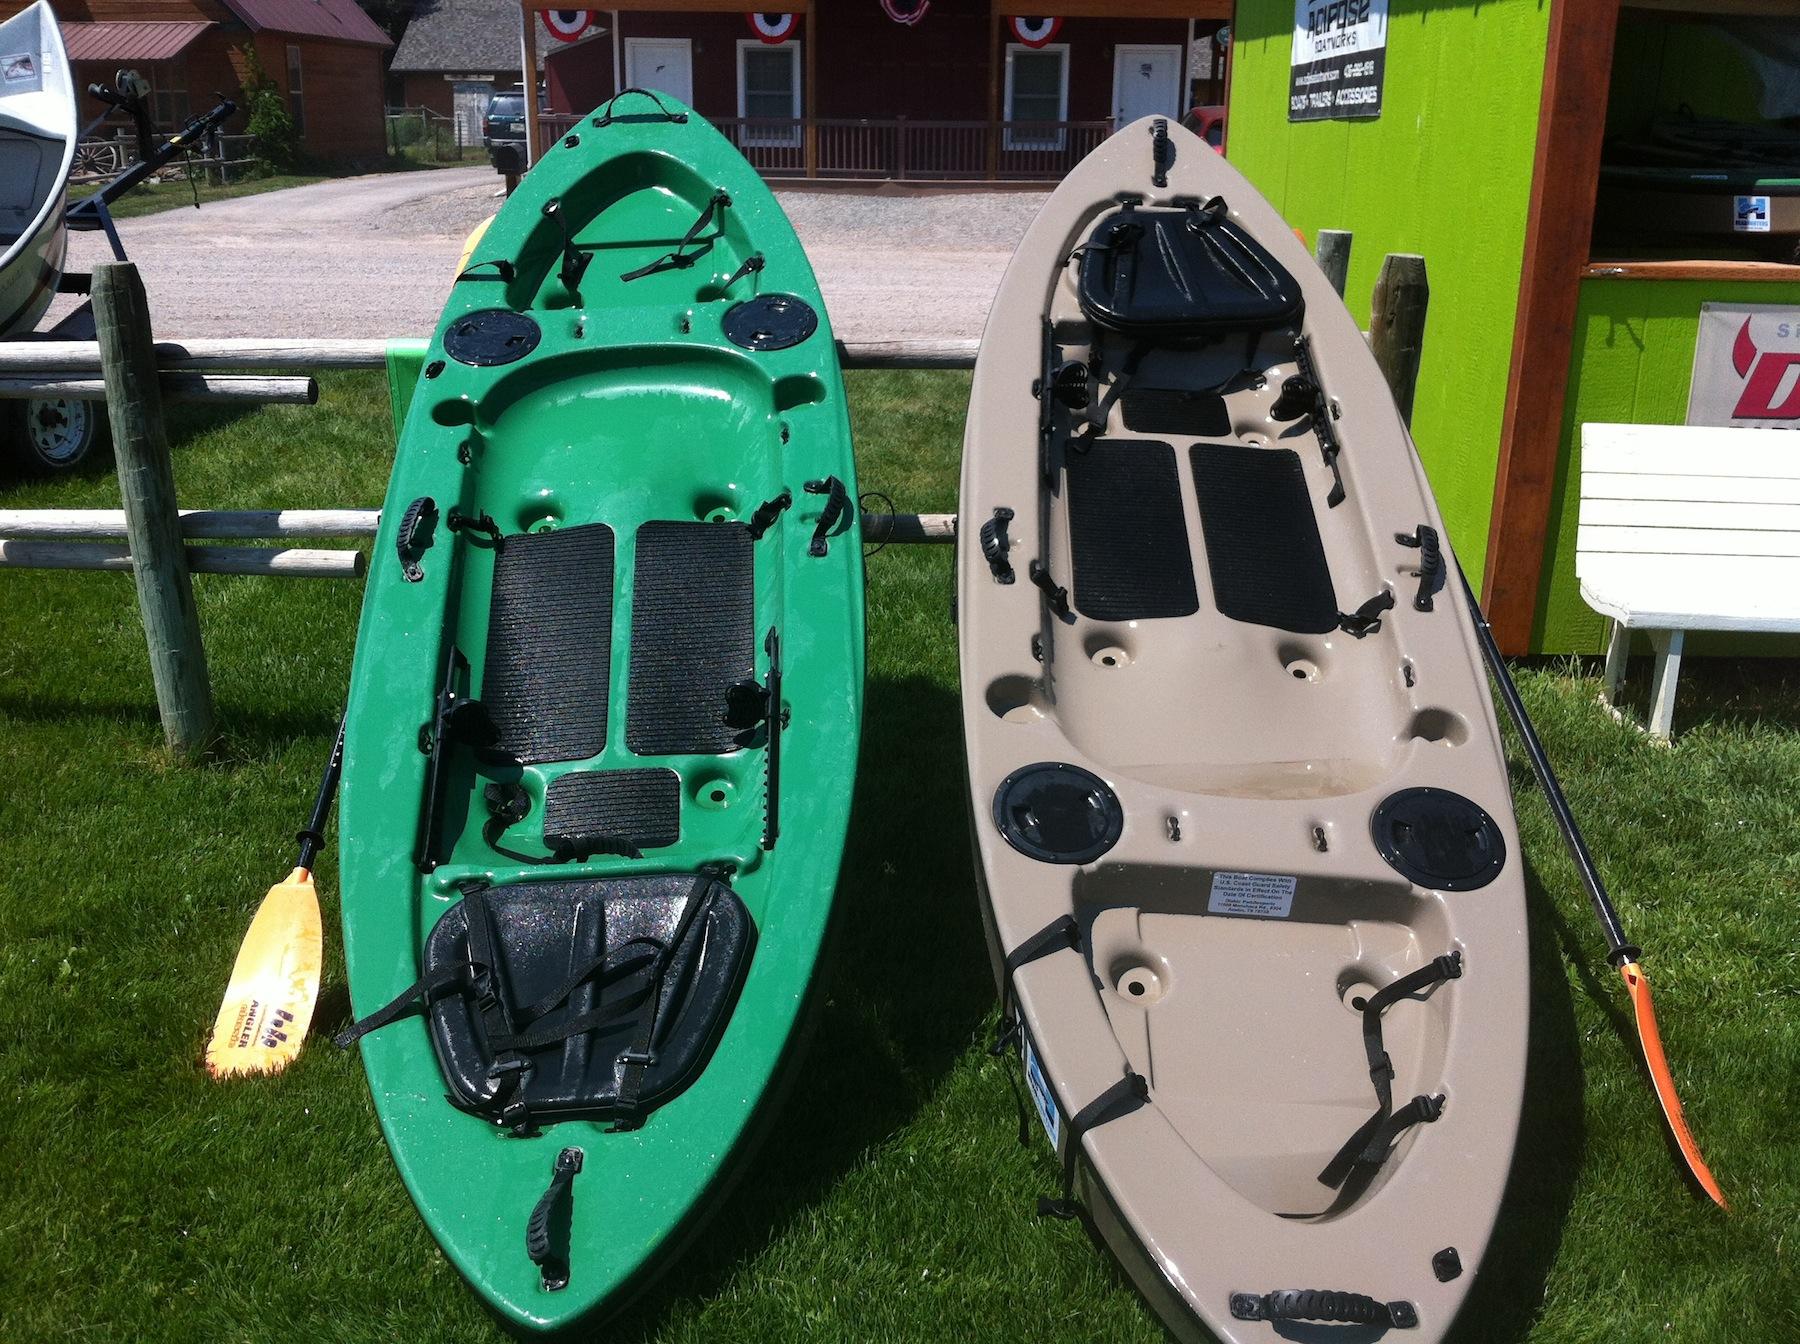 larry chair kayak poppy high black diablo kayaks sale headhunters fly shop